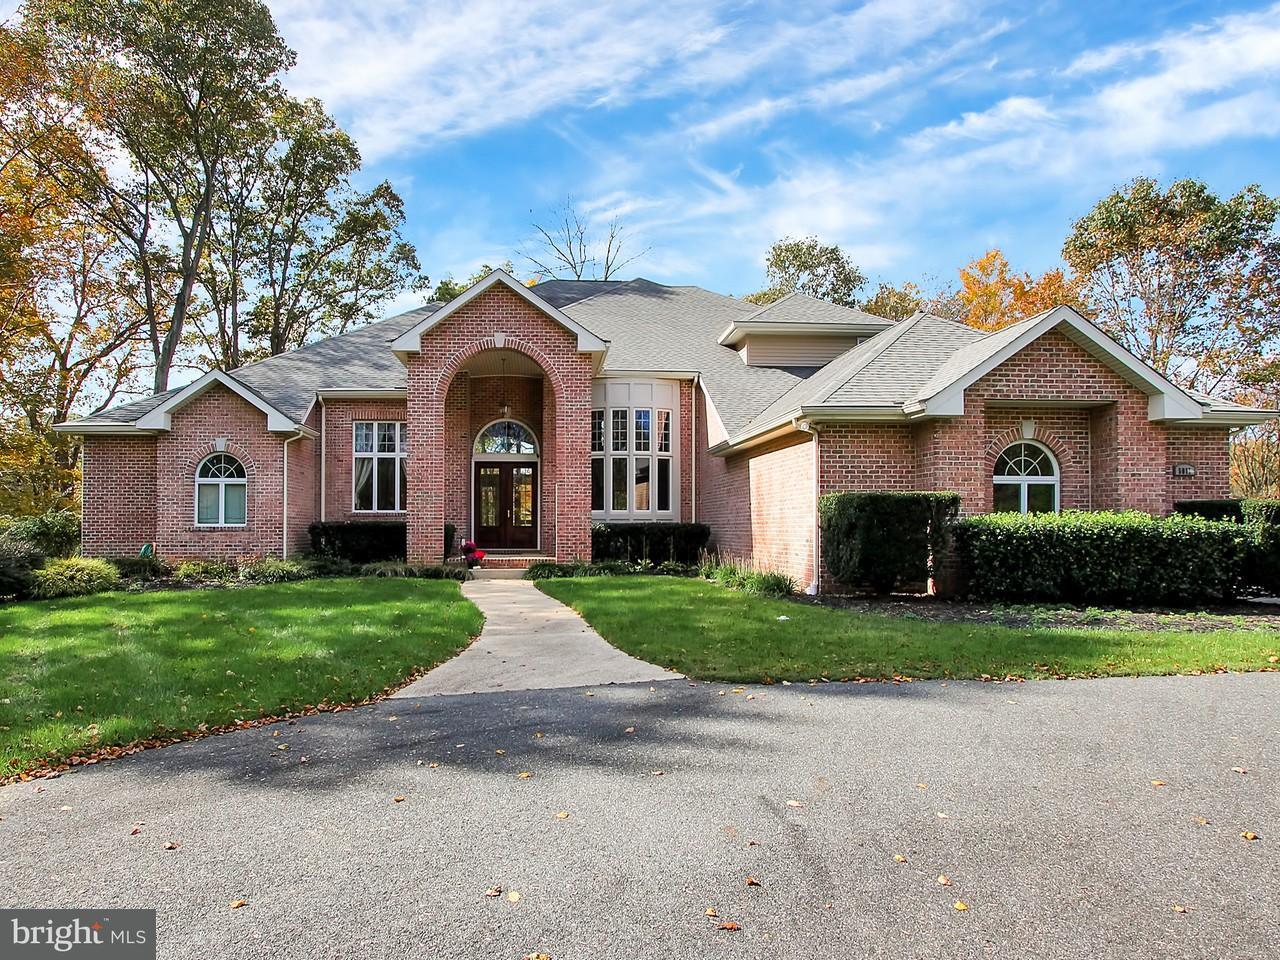 独户住宅 为 销售 在 5011 NORRISVILLE Road 5011 NORRISVILLE Road White Hall, 马里兰州 21161 美国